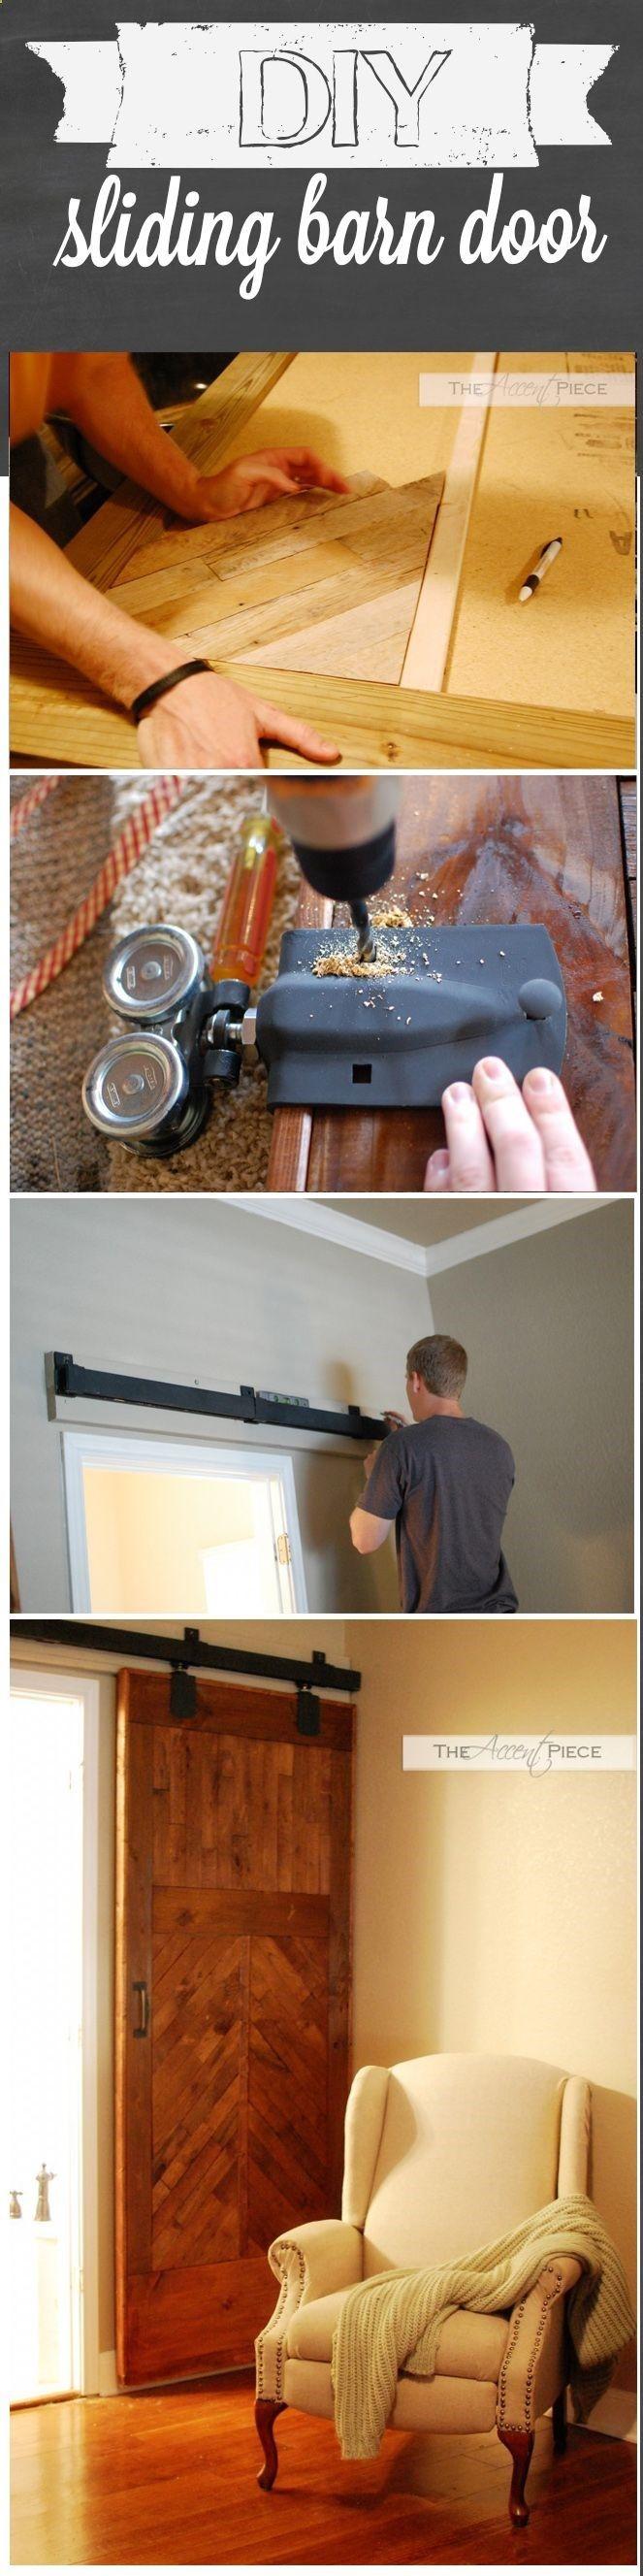 Diy Sliding Barn Door Home Pinterest